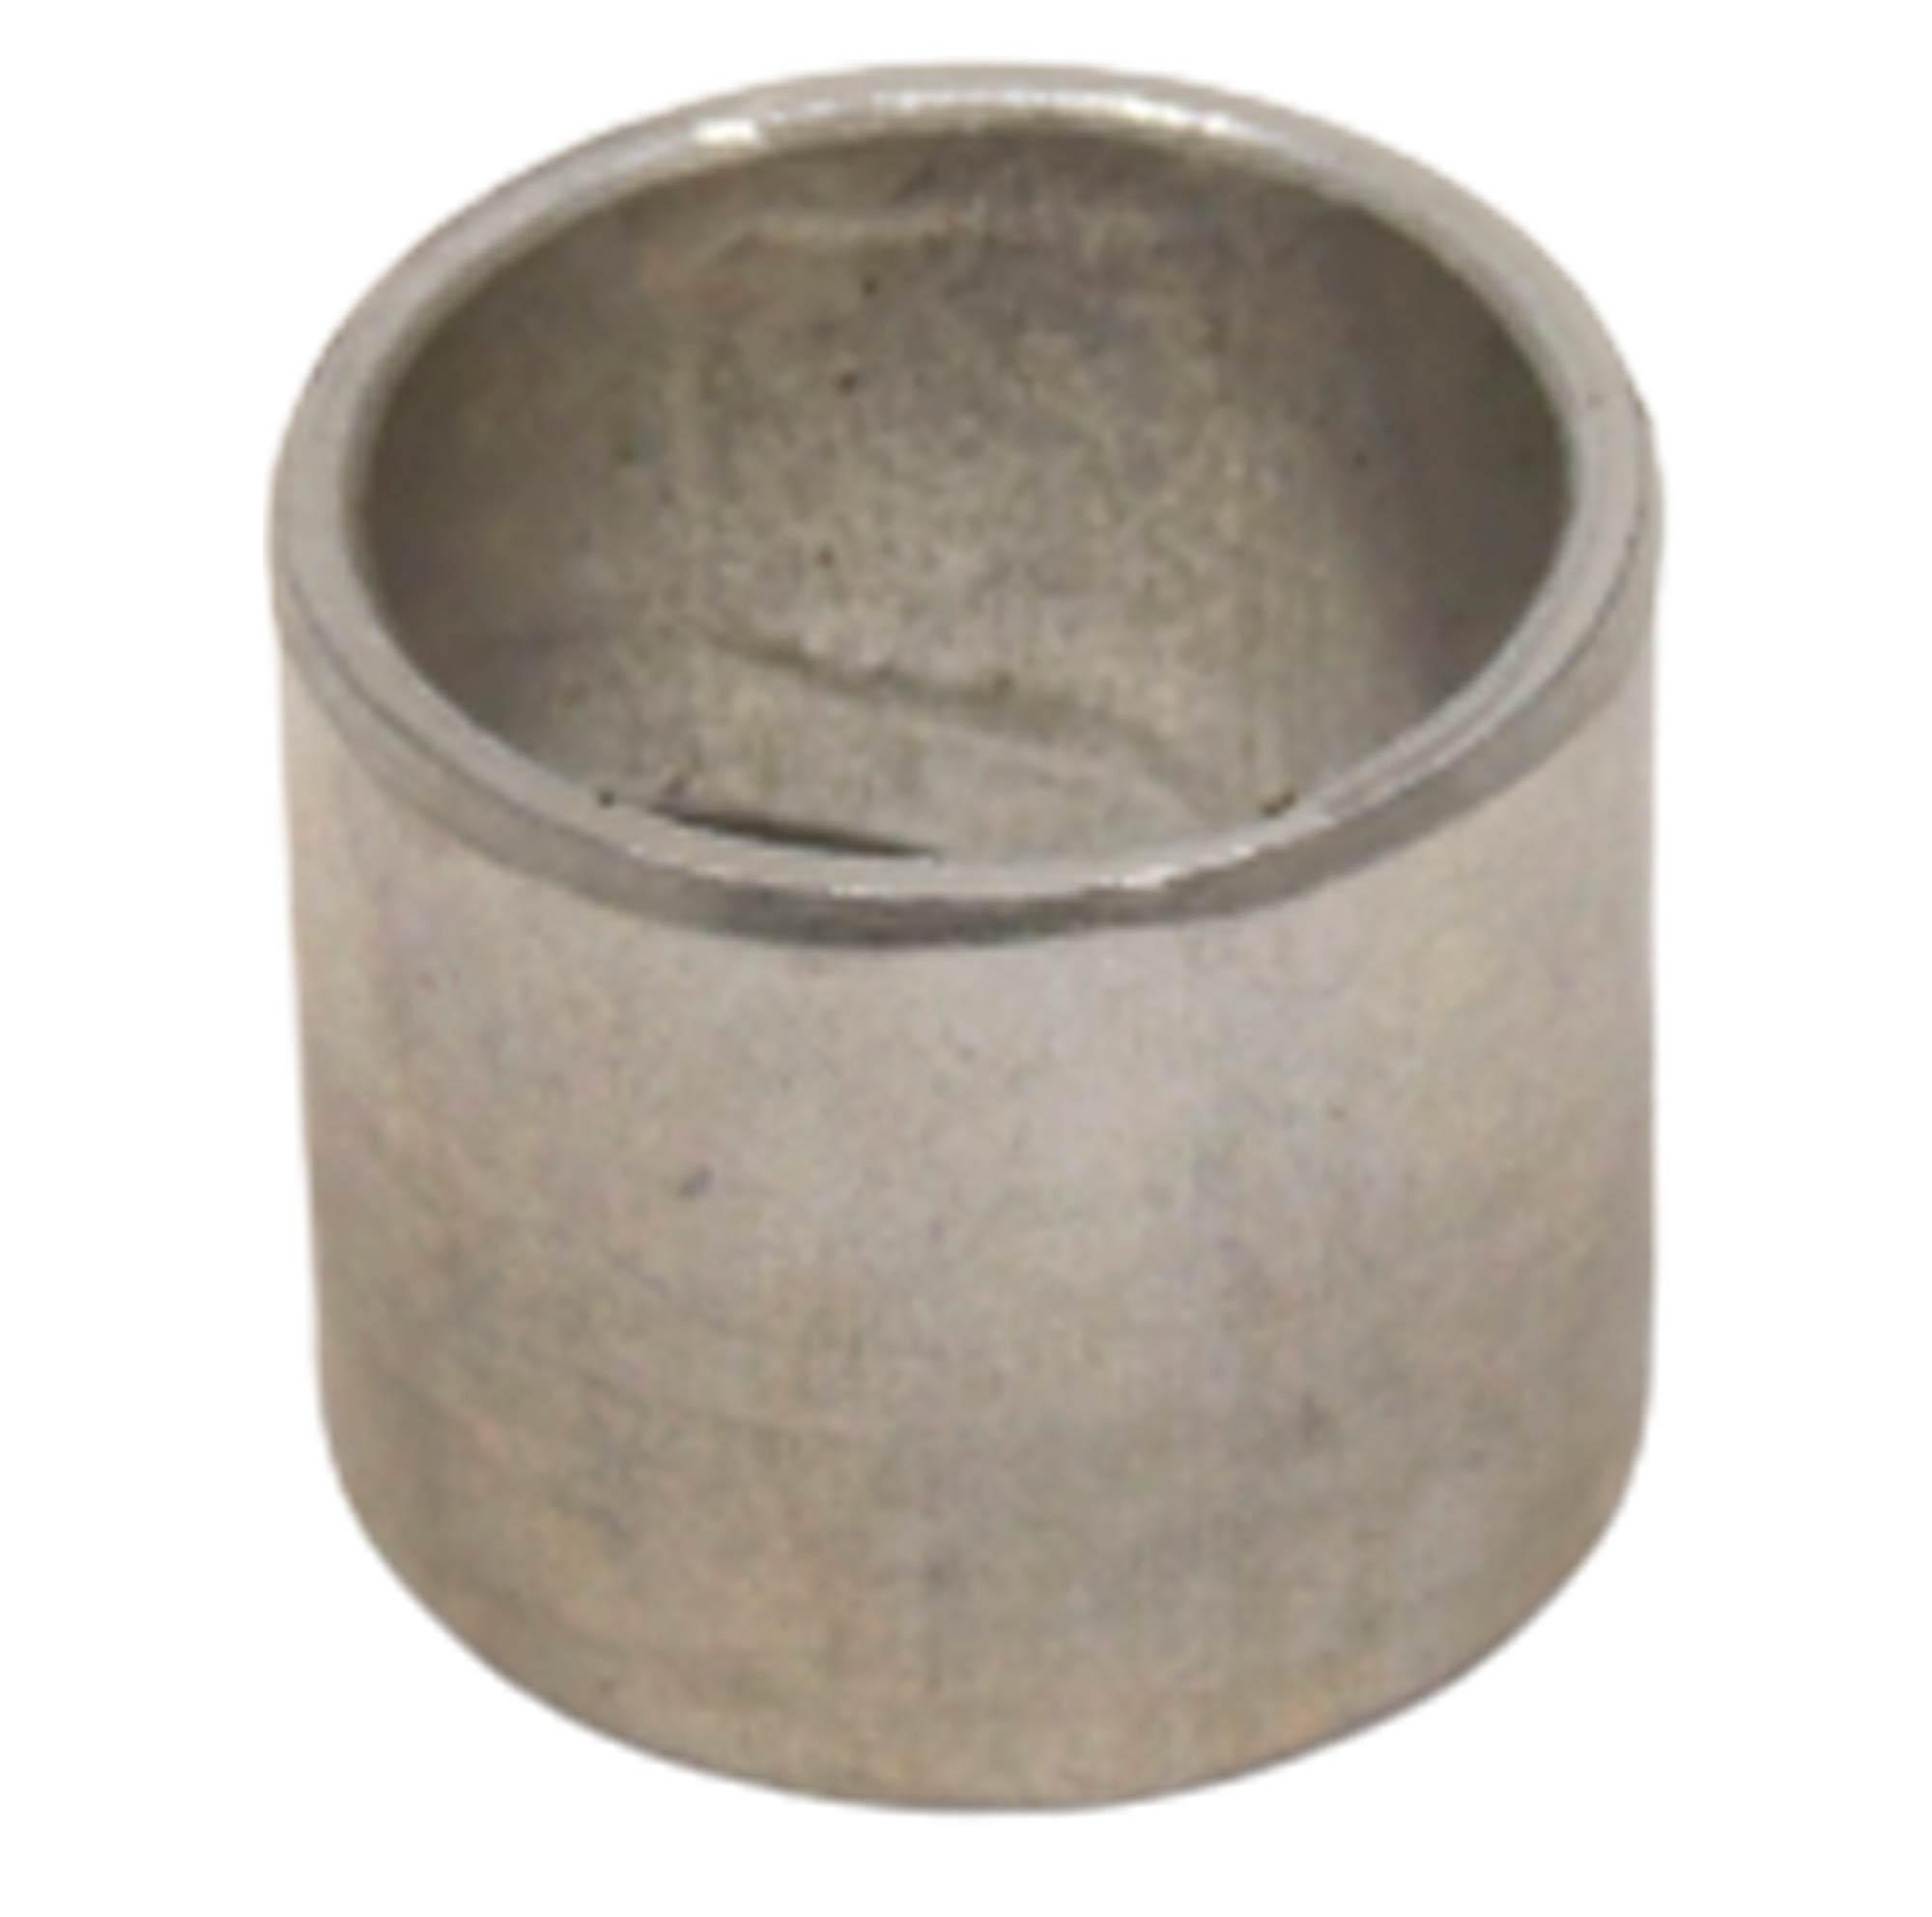 3312252 - Bucha de aço